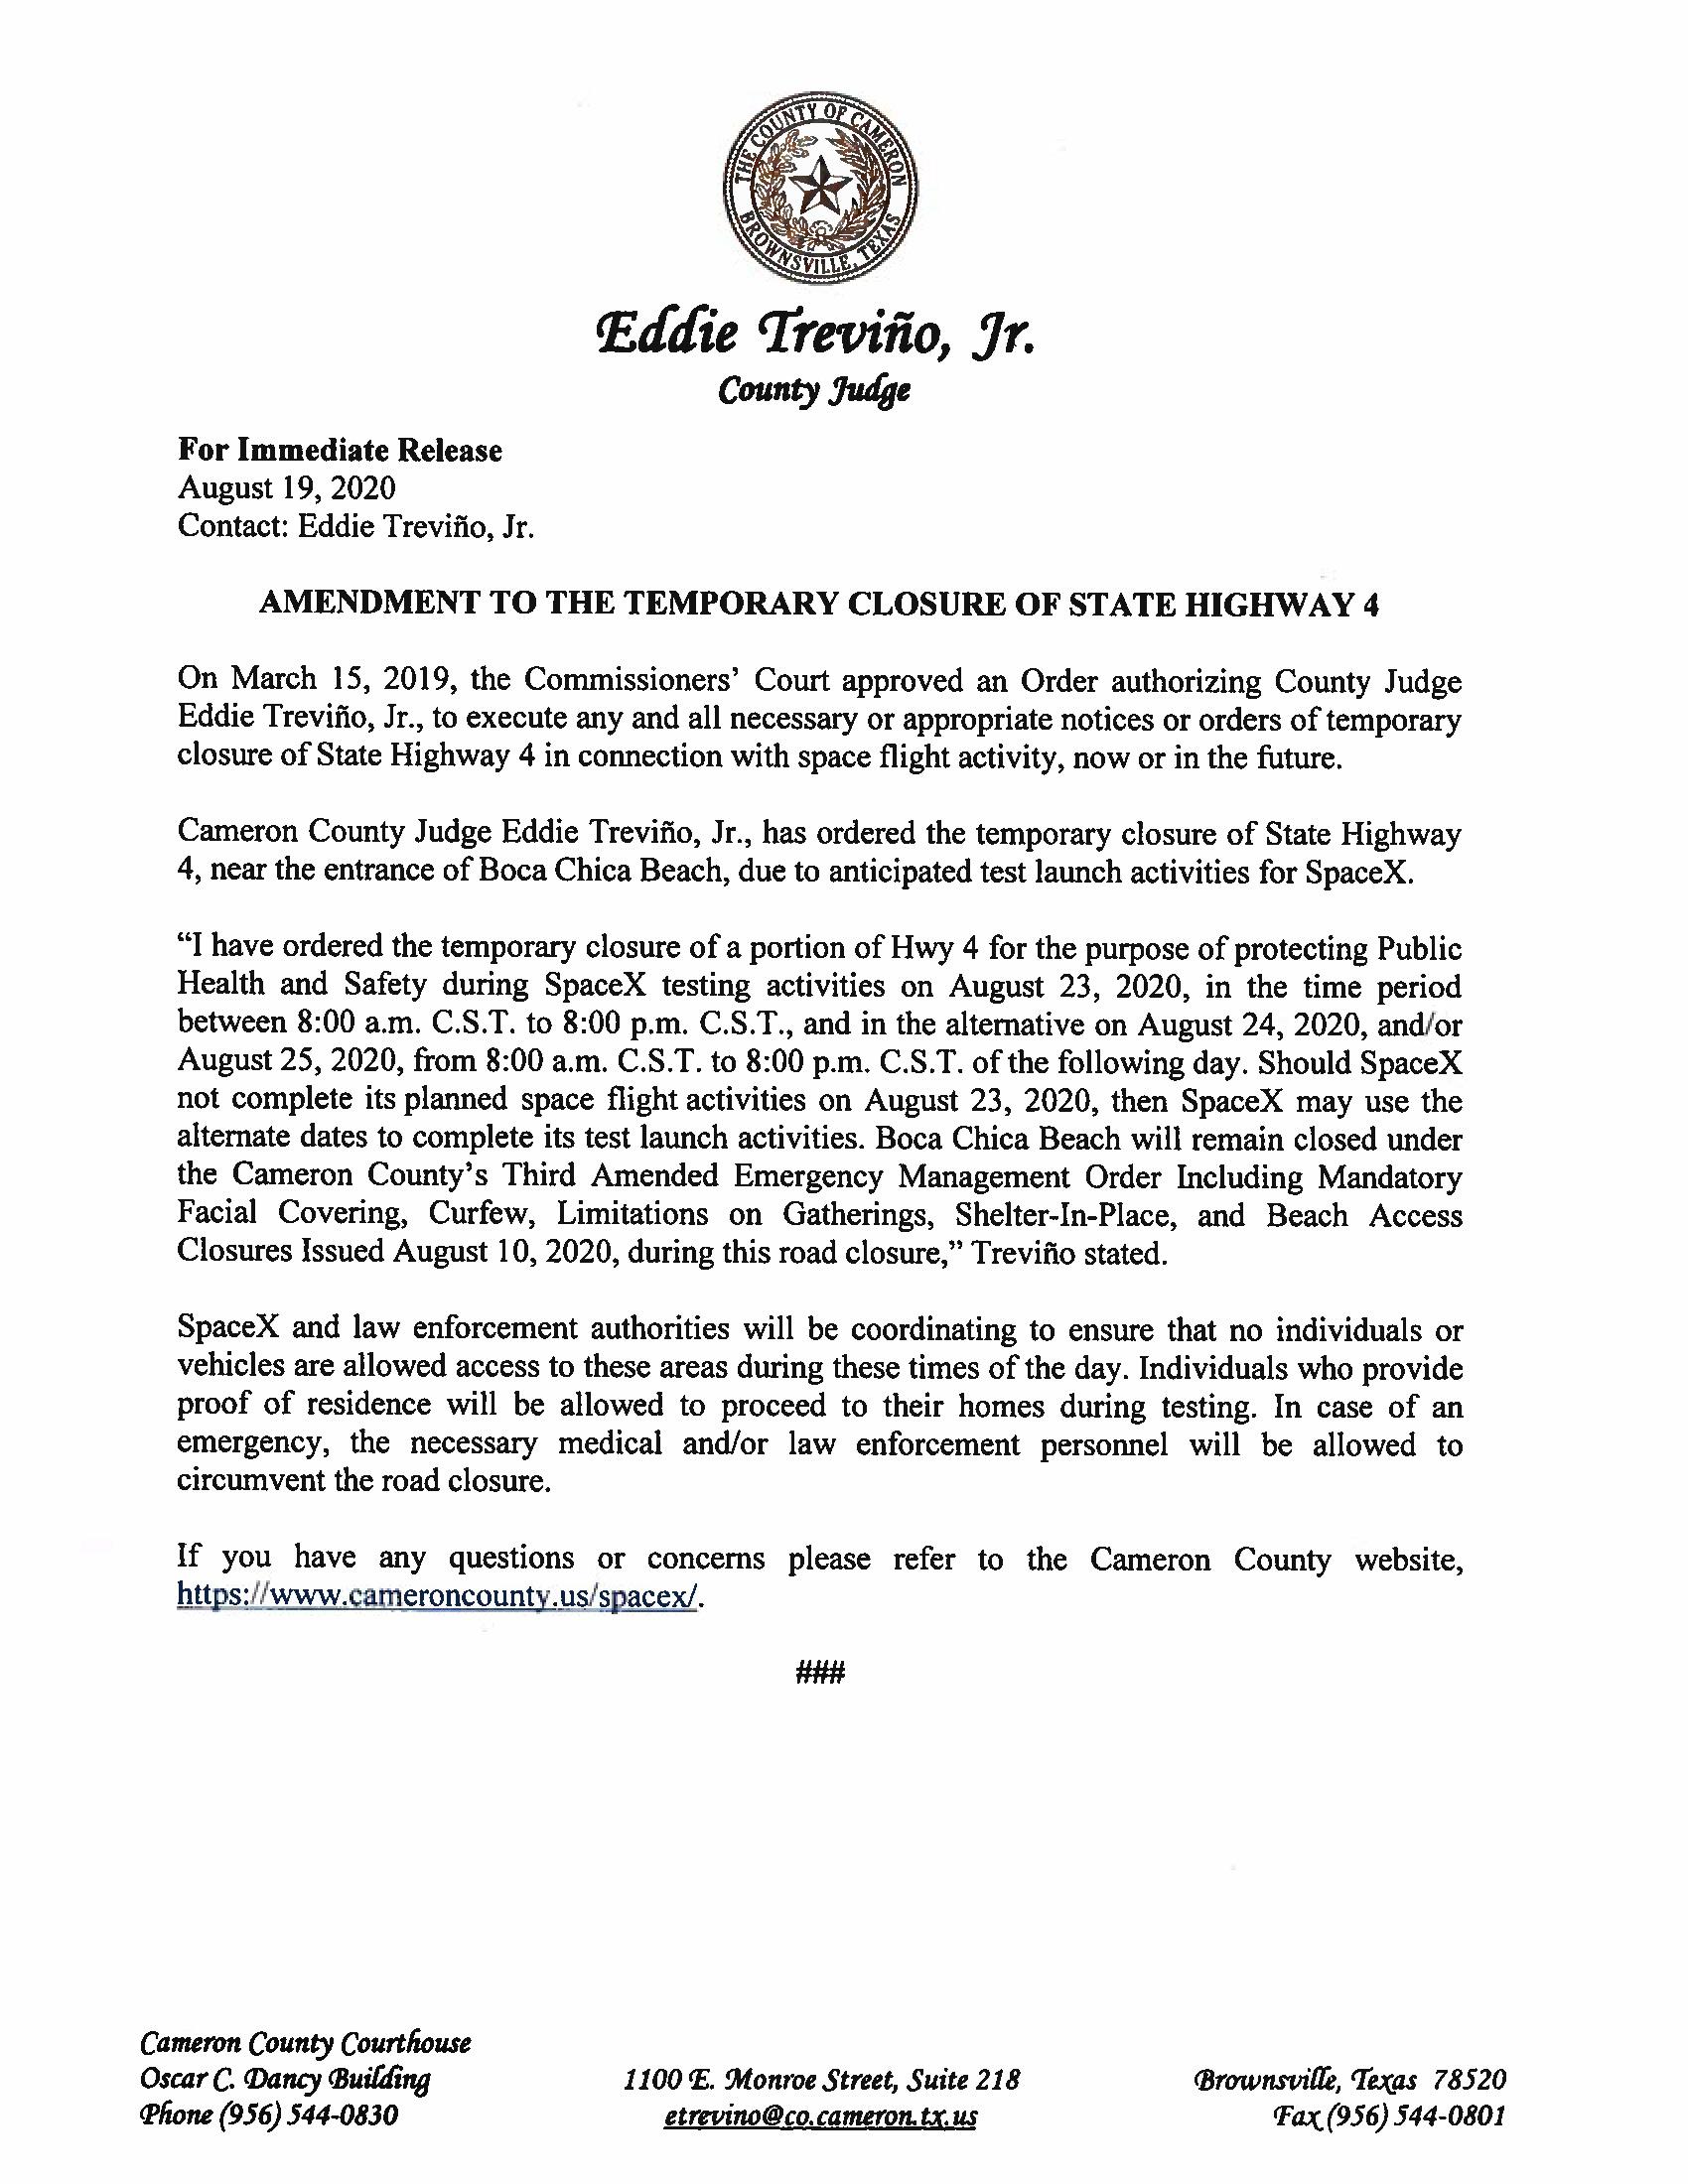 Amendment To Press Release English Spanish 8.23.20 Page 1